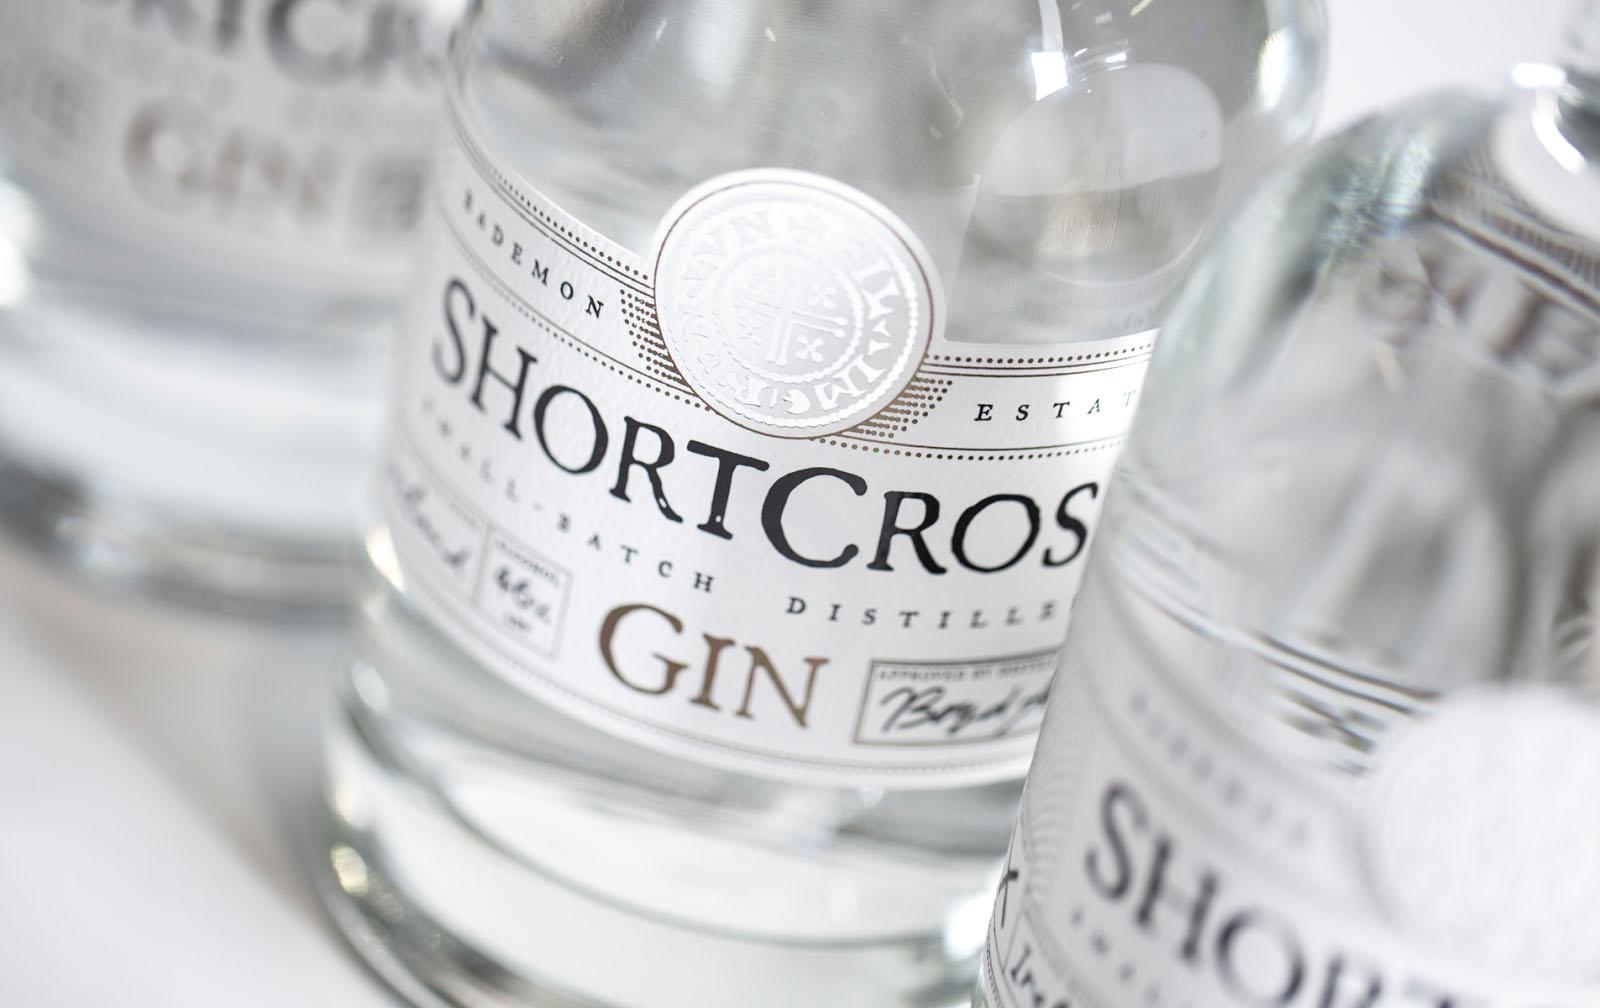 Shortcross-Gin-02